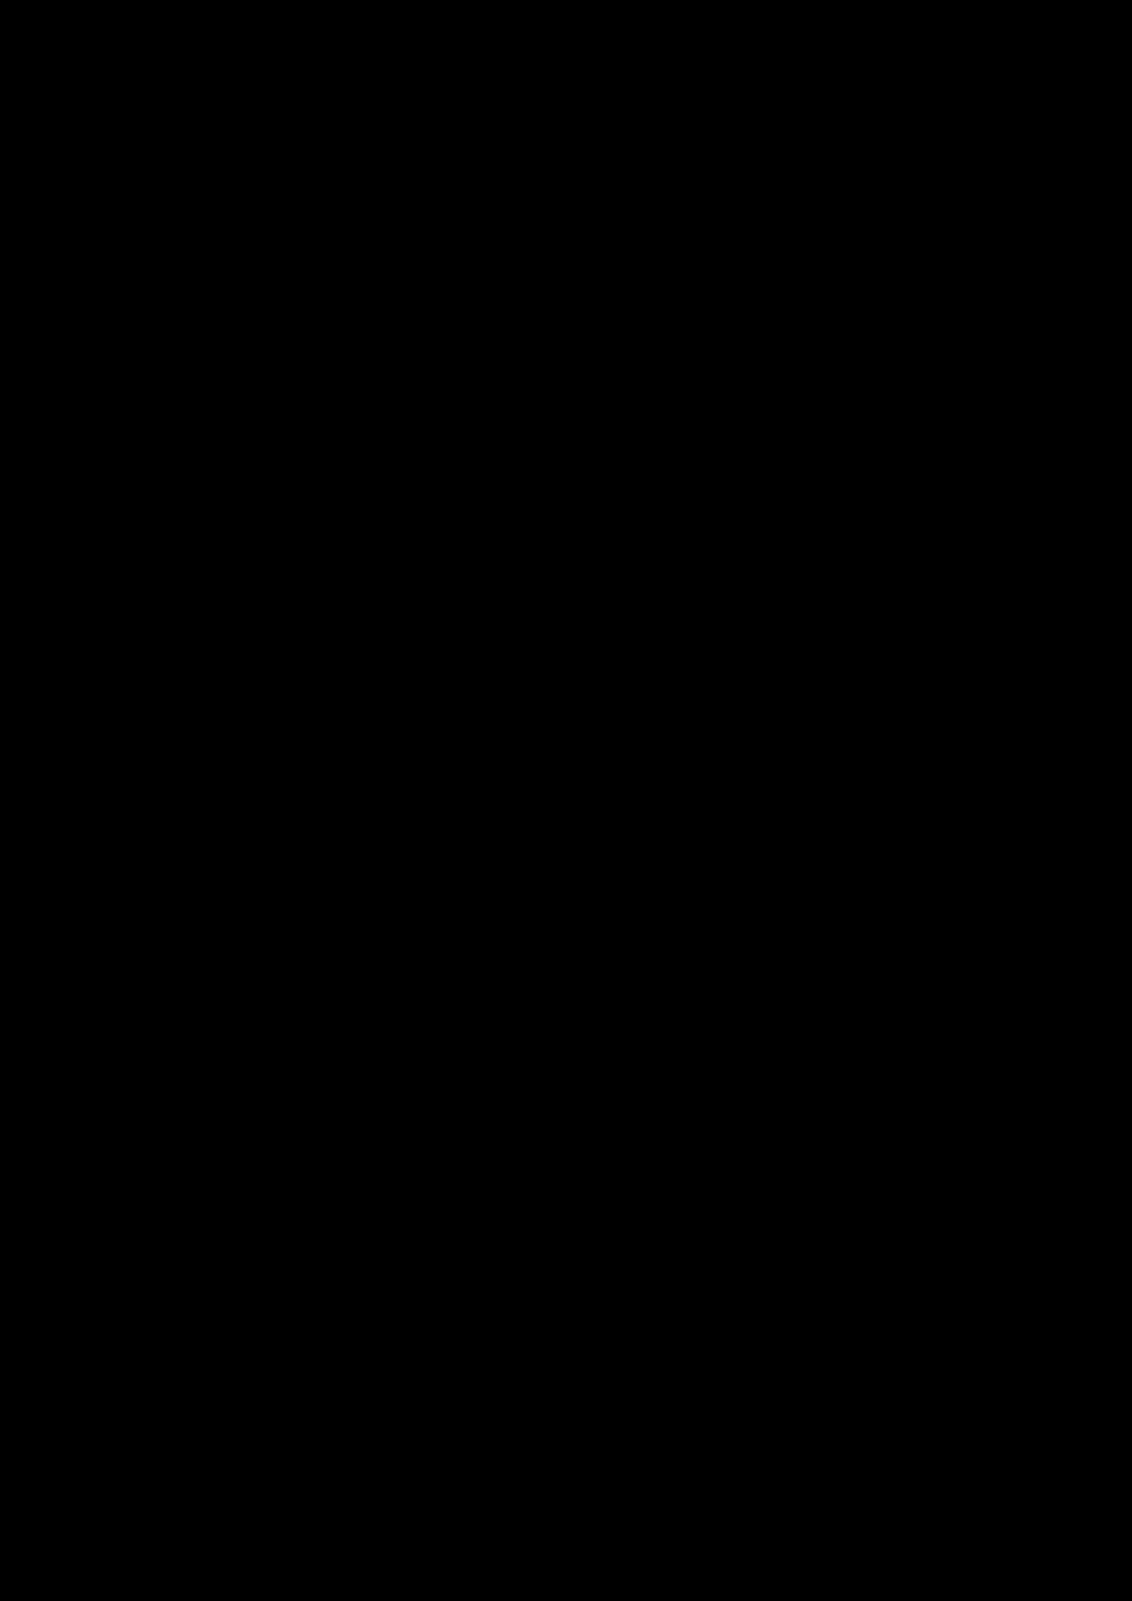 Ot Bolshogo Uma slide, Image 1